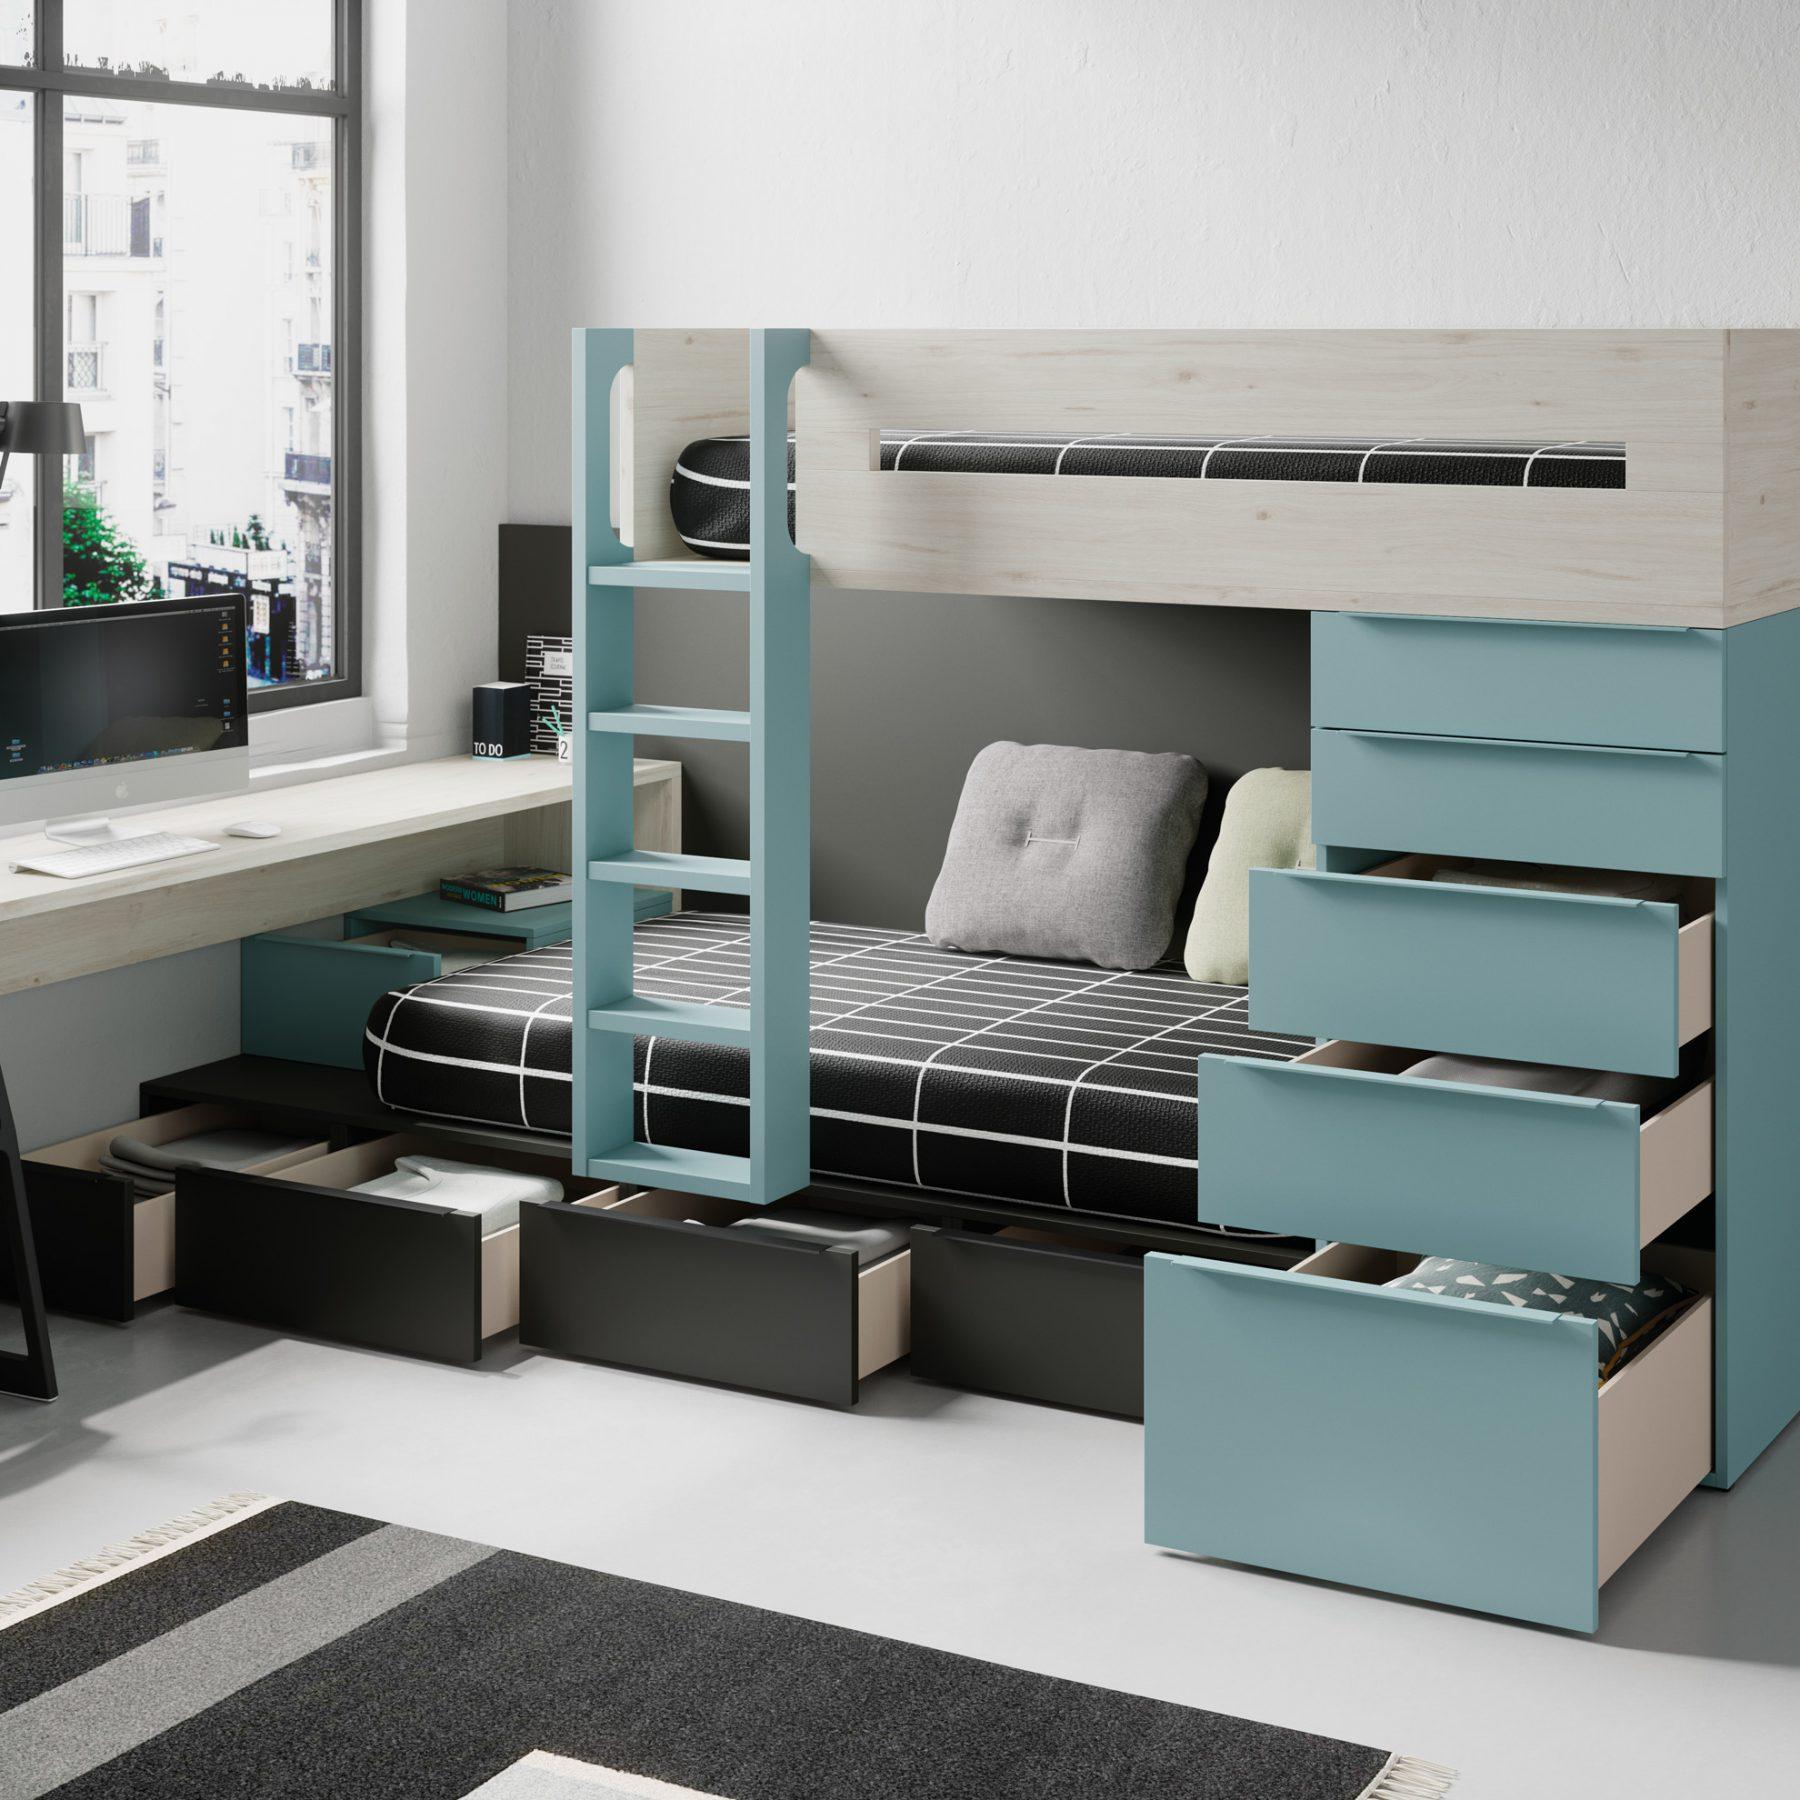 6f033d5f0 Dormitorios Juveniles e infantiles en Zaragoza   VIVAREA Nebra   Tiendas de  Muebles